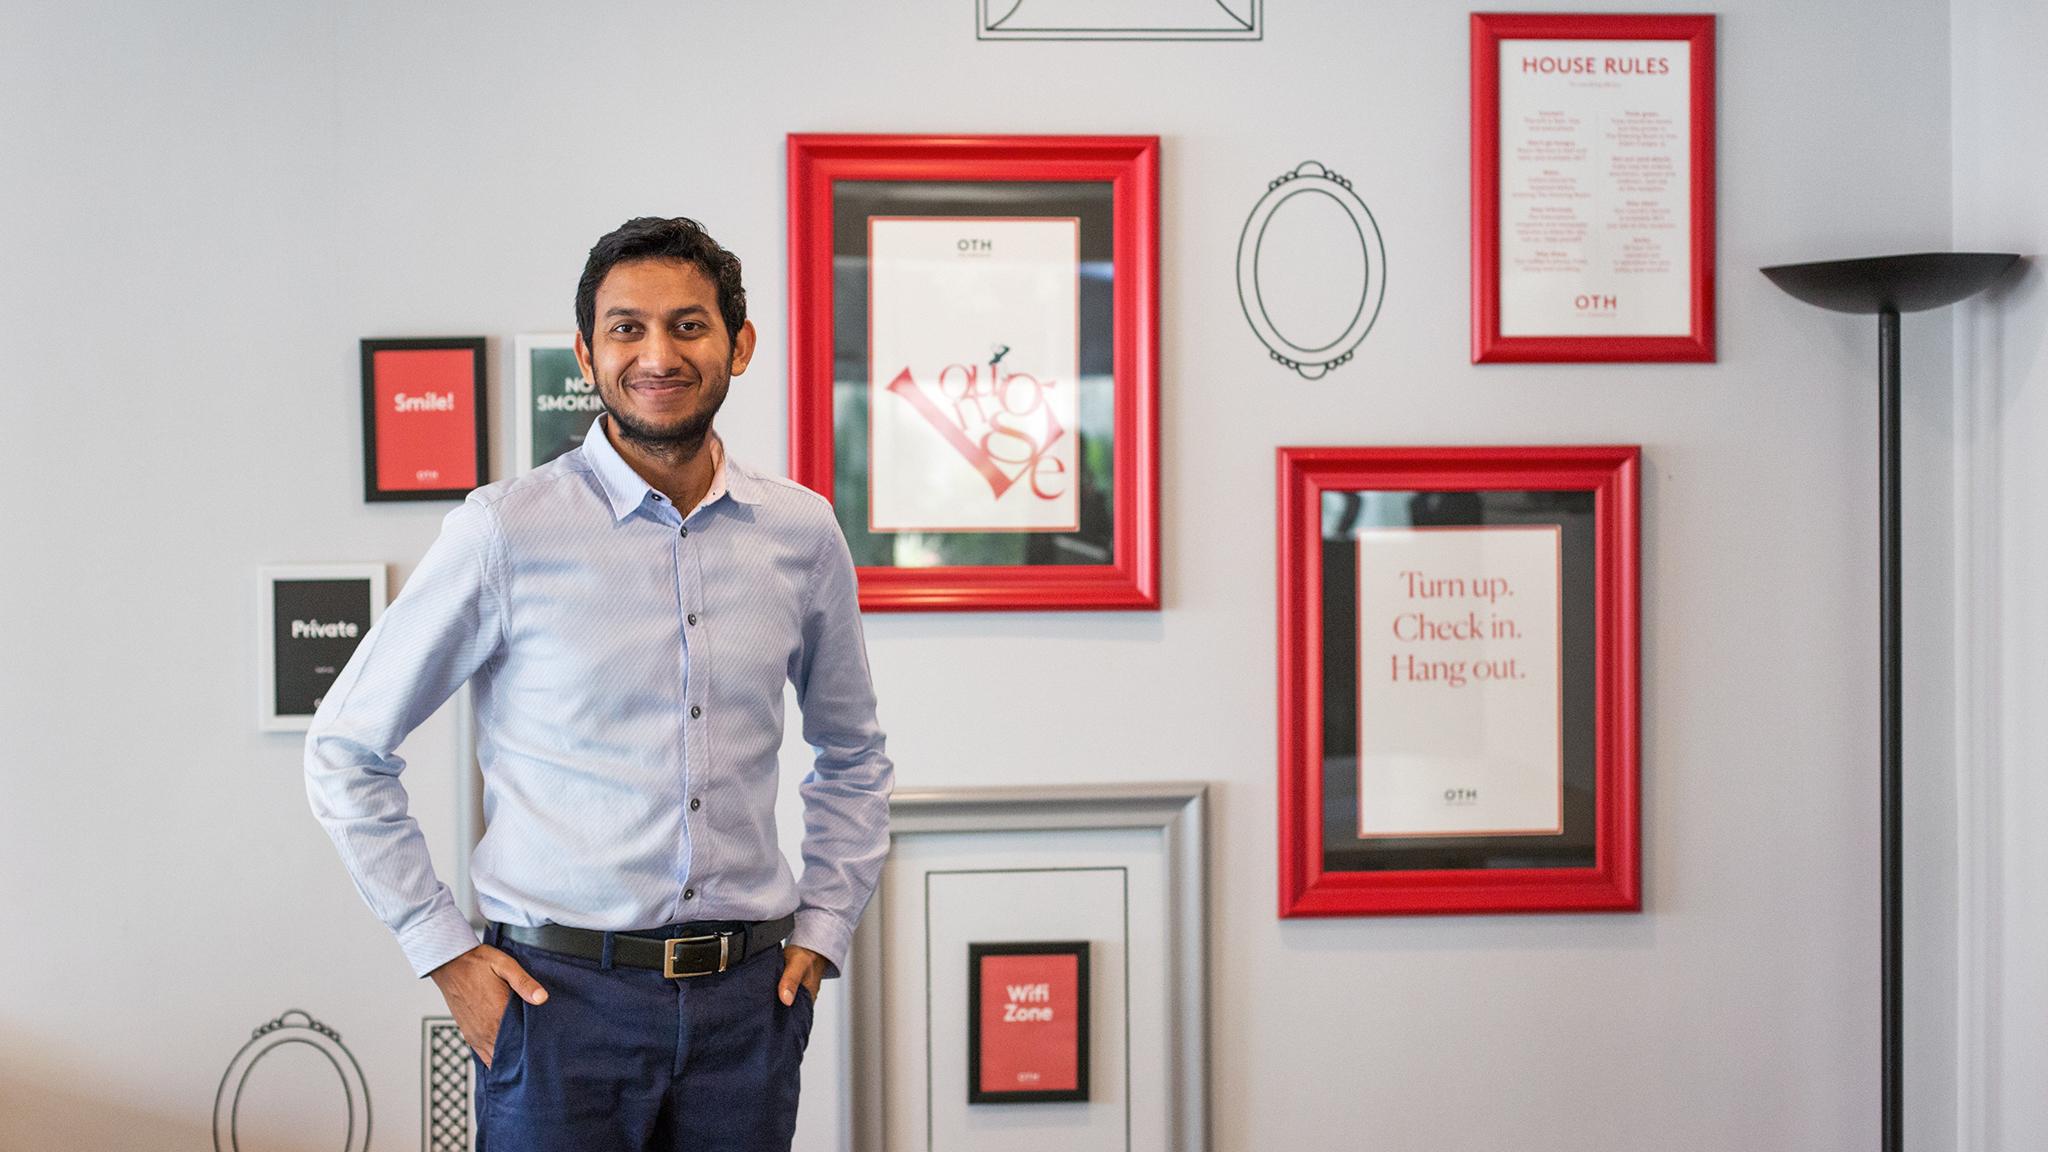 Oyo Rooms' Ritesh Agarwal: unorthodox leadership pays